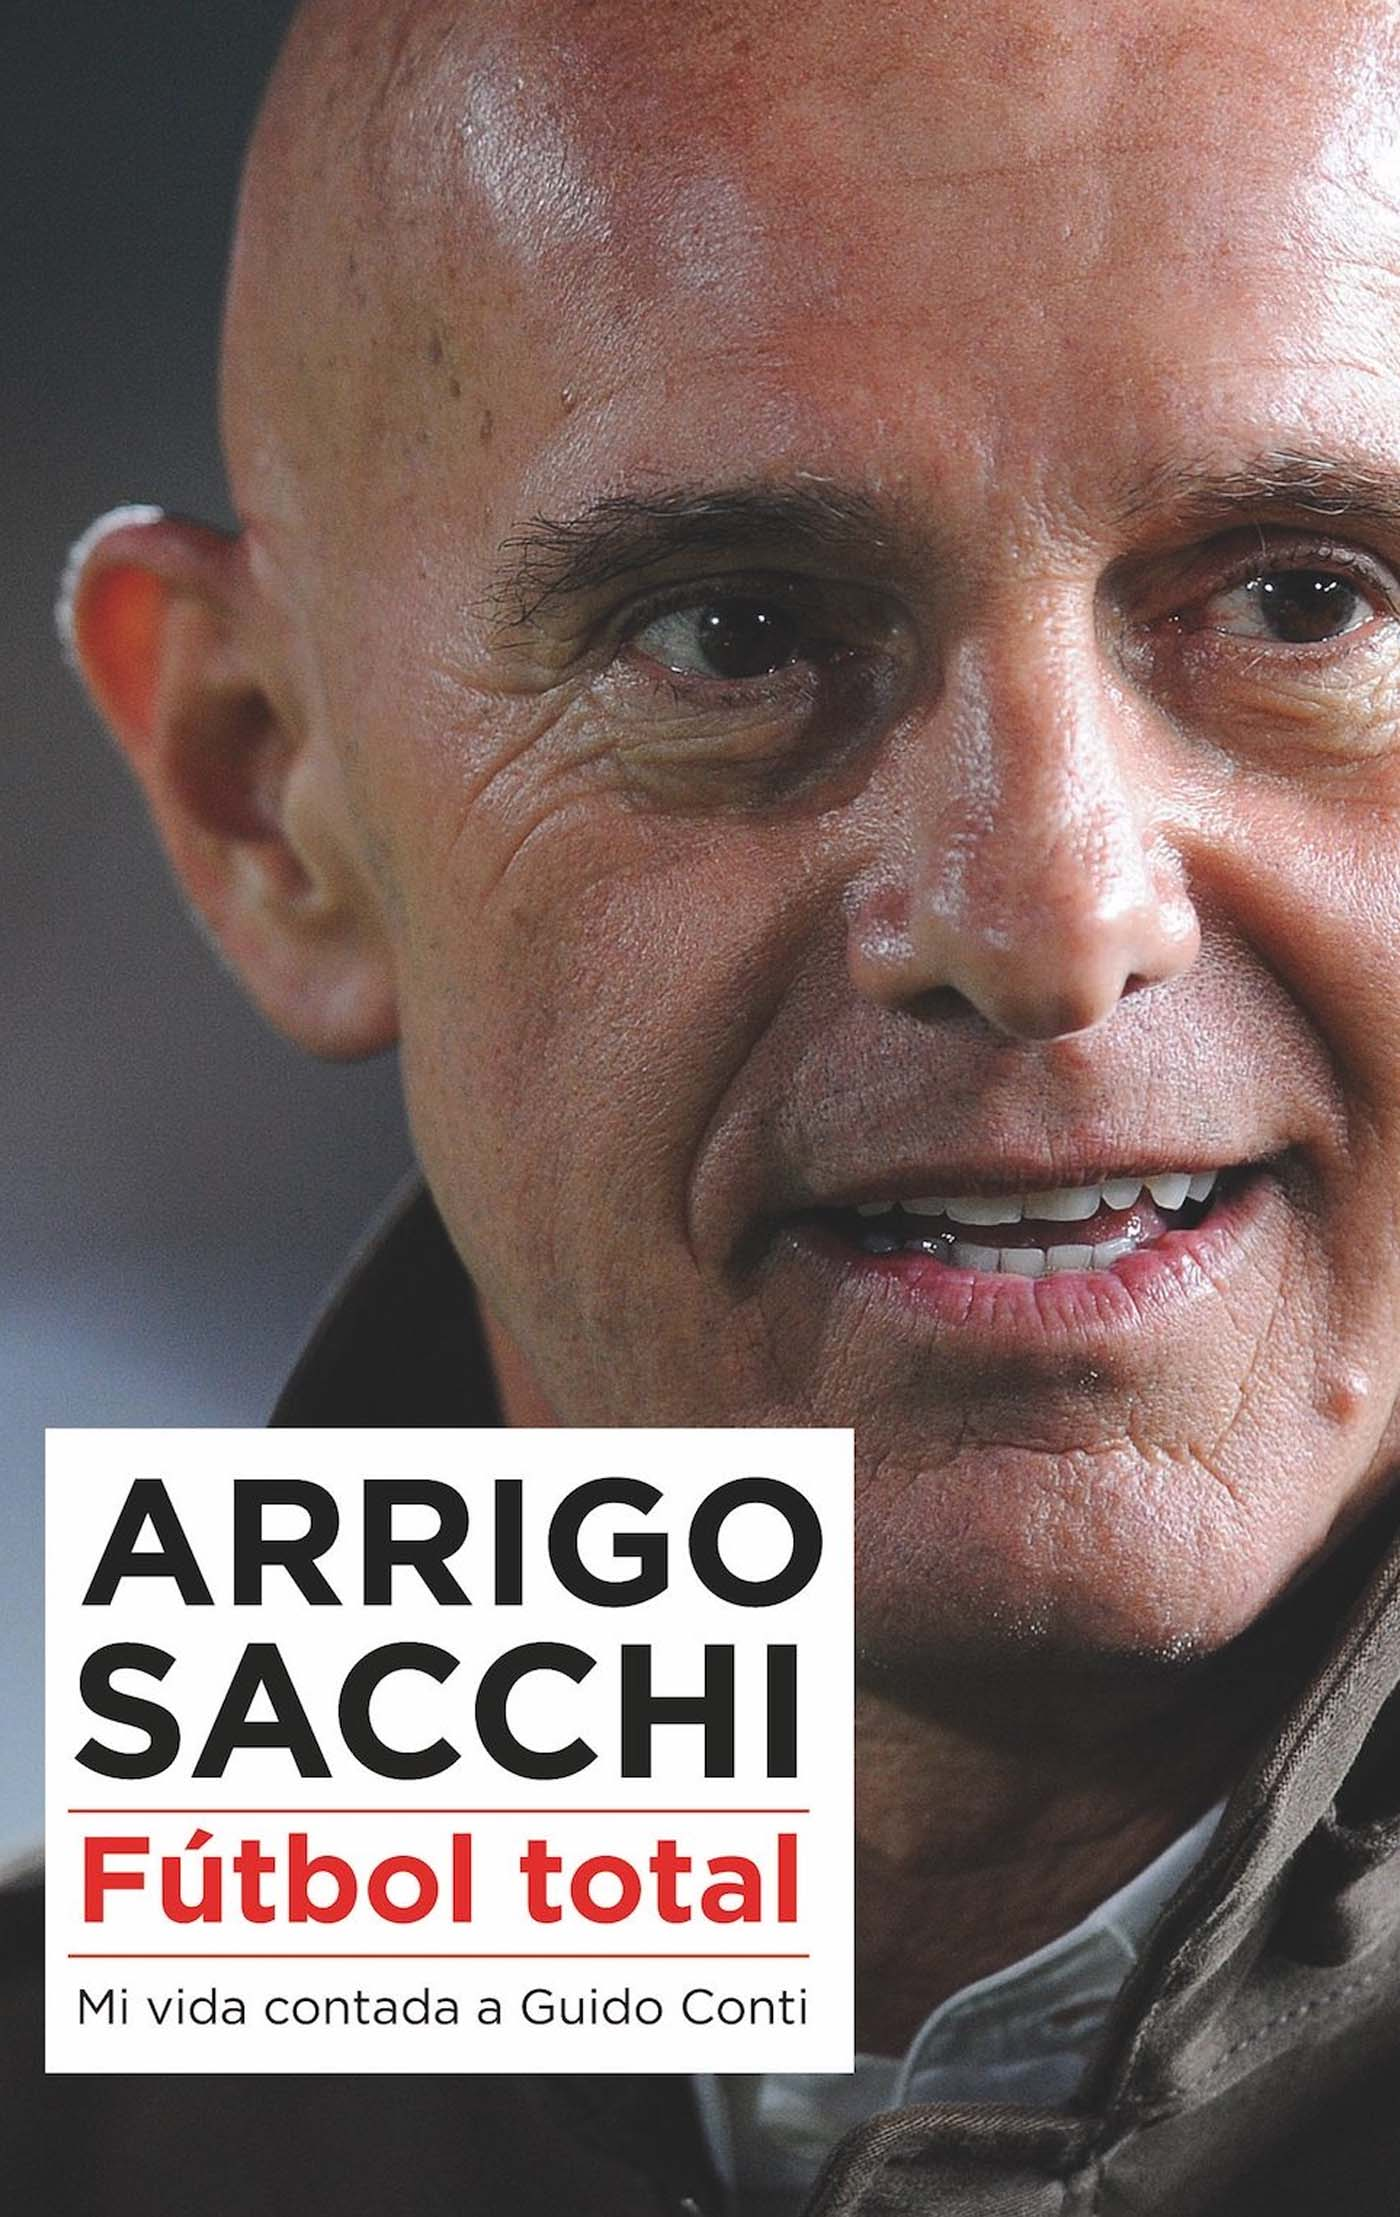 Arrigo Sacchi - Fútbol total